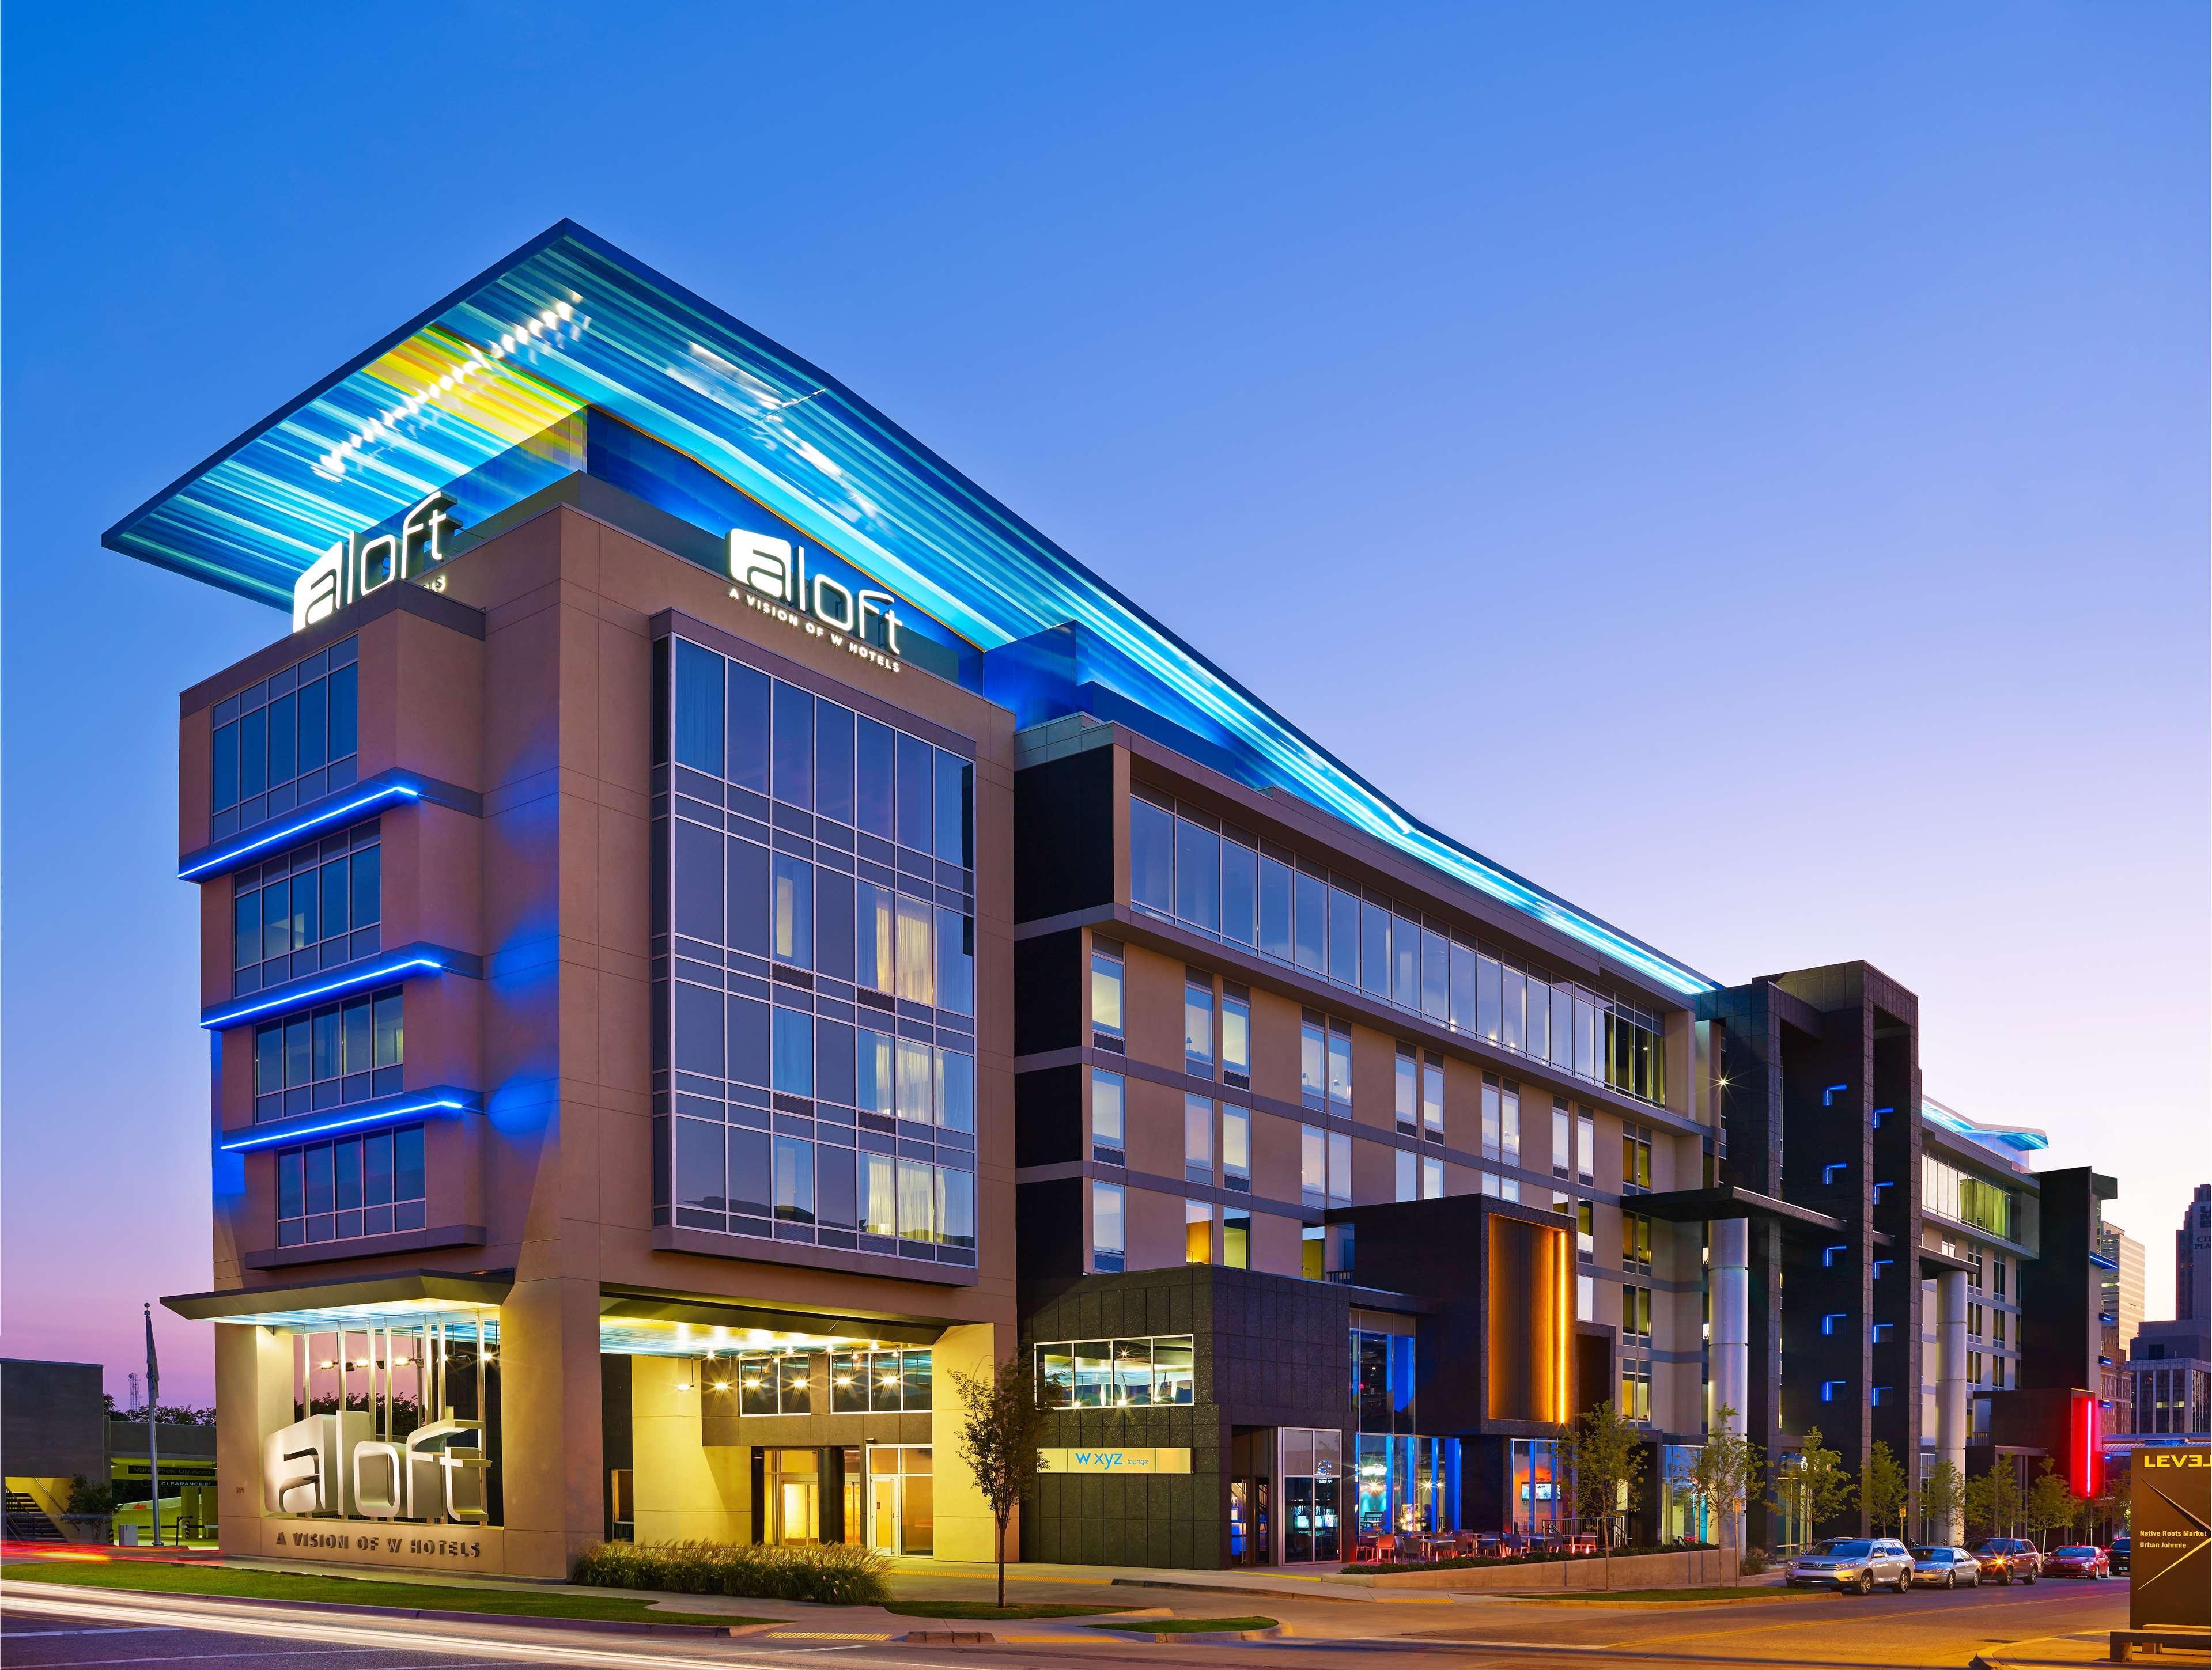 Aloft Oklahoma City Downtown - Bricktown image 0